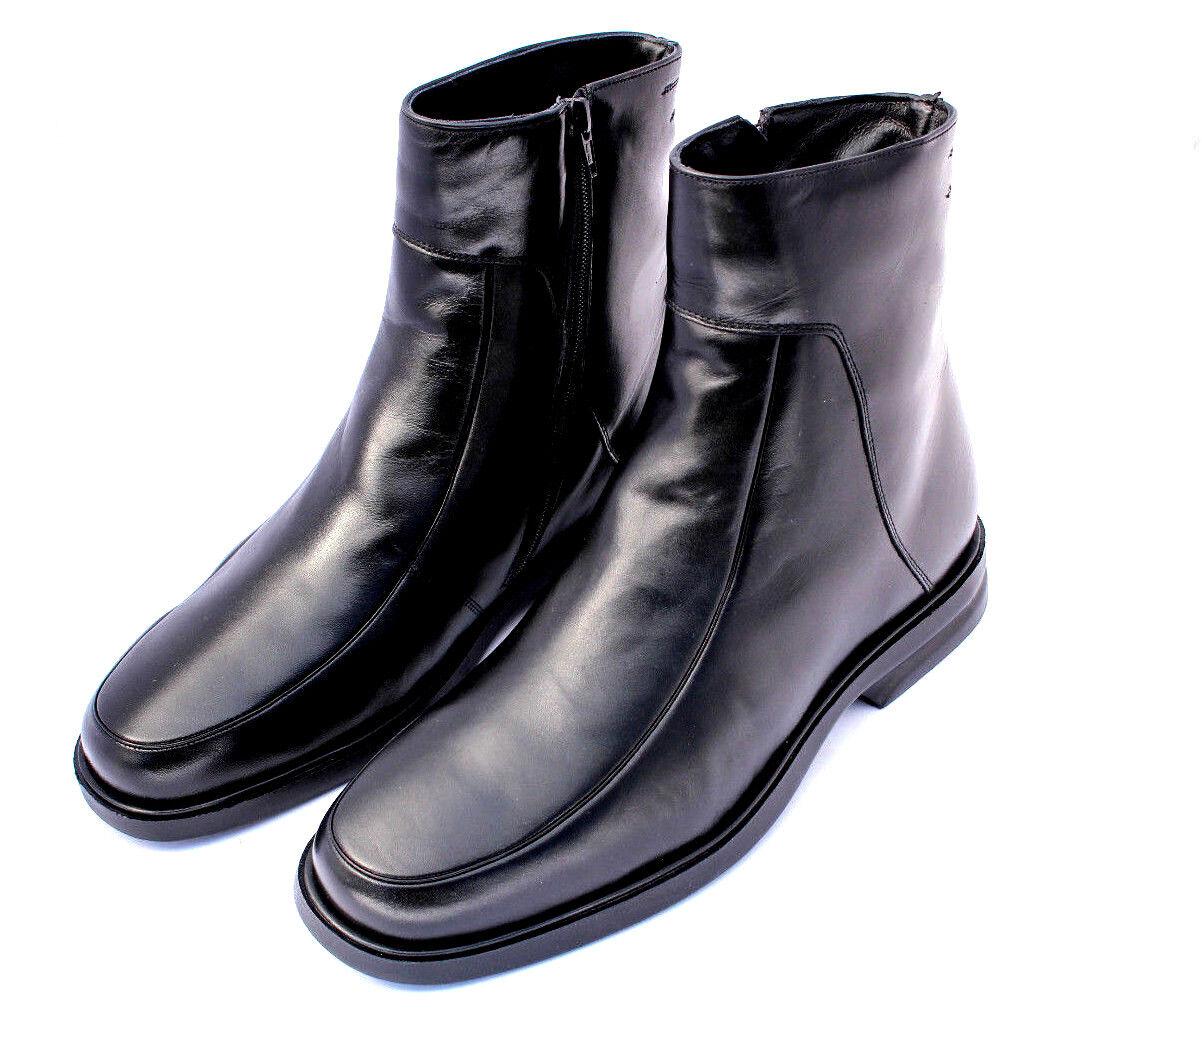 Herren Leder Halbstiefel Stiefel EUR gefüttert Stiefeletten Leather botas EUR Stiefel 38-46 a4e105